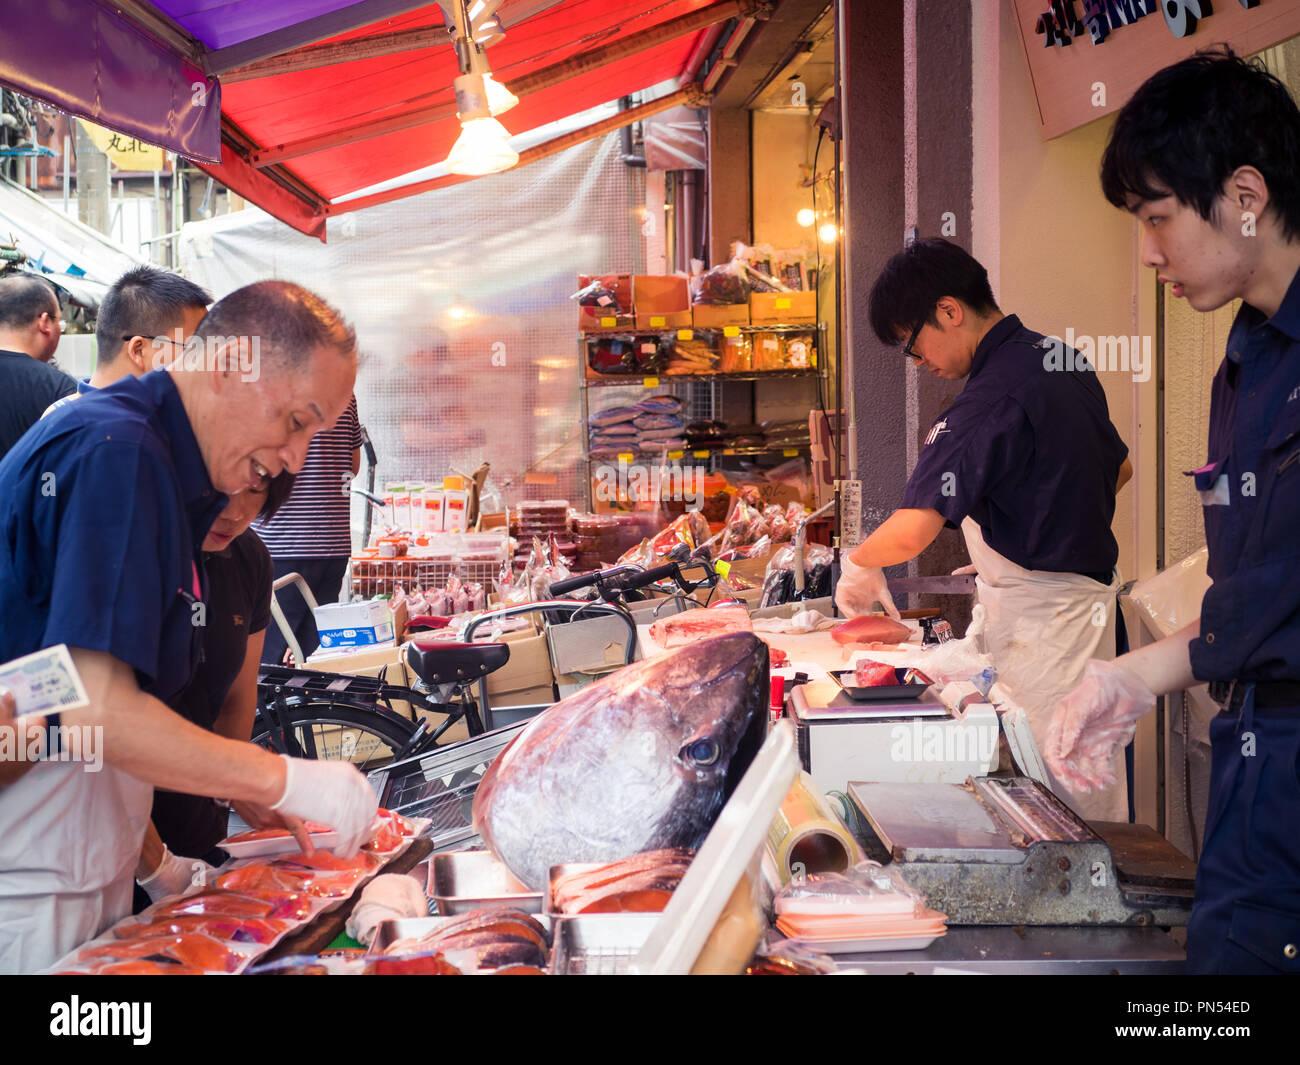 Fish mongers work with tuna at the Tsukiji Fish Market (Tsukiji outer market) in Tsukiji, Tokyo, Japan. Stock Photo